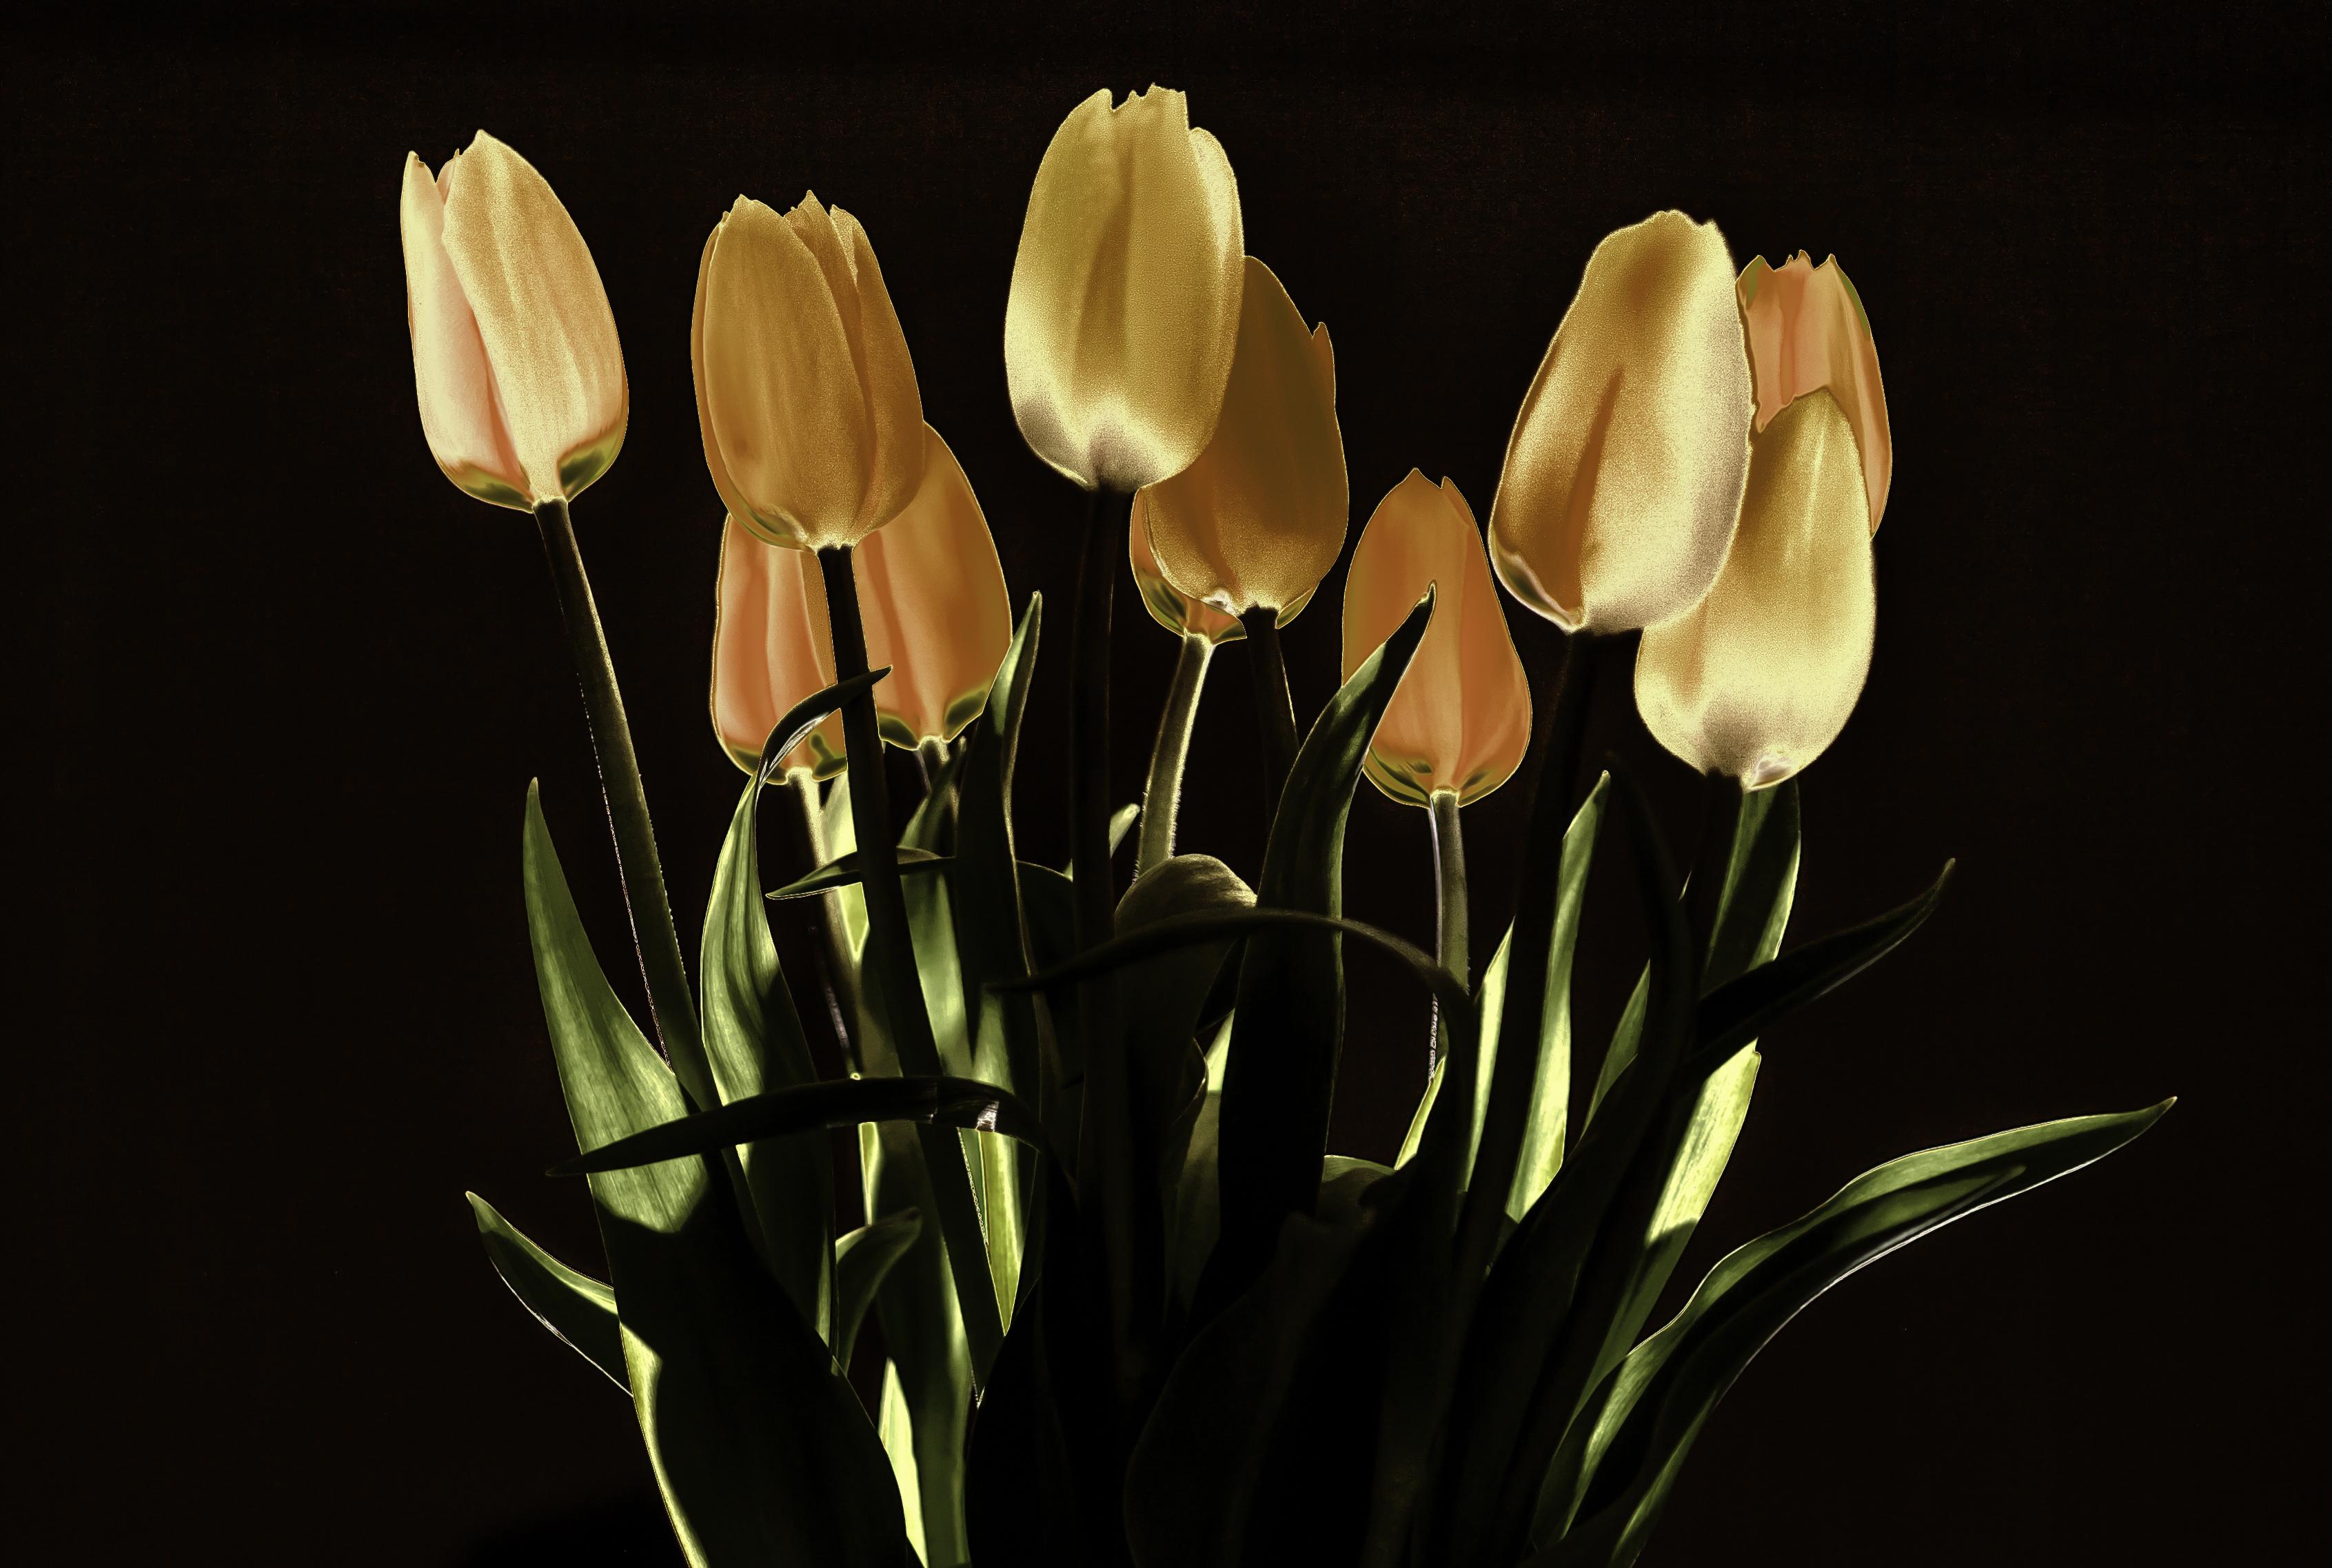 Night light wikipedia - File Tulips At Night Light 8147134594 Jpg